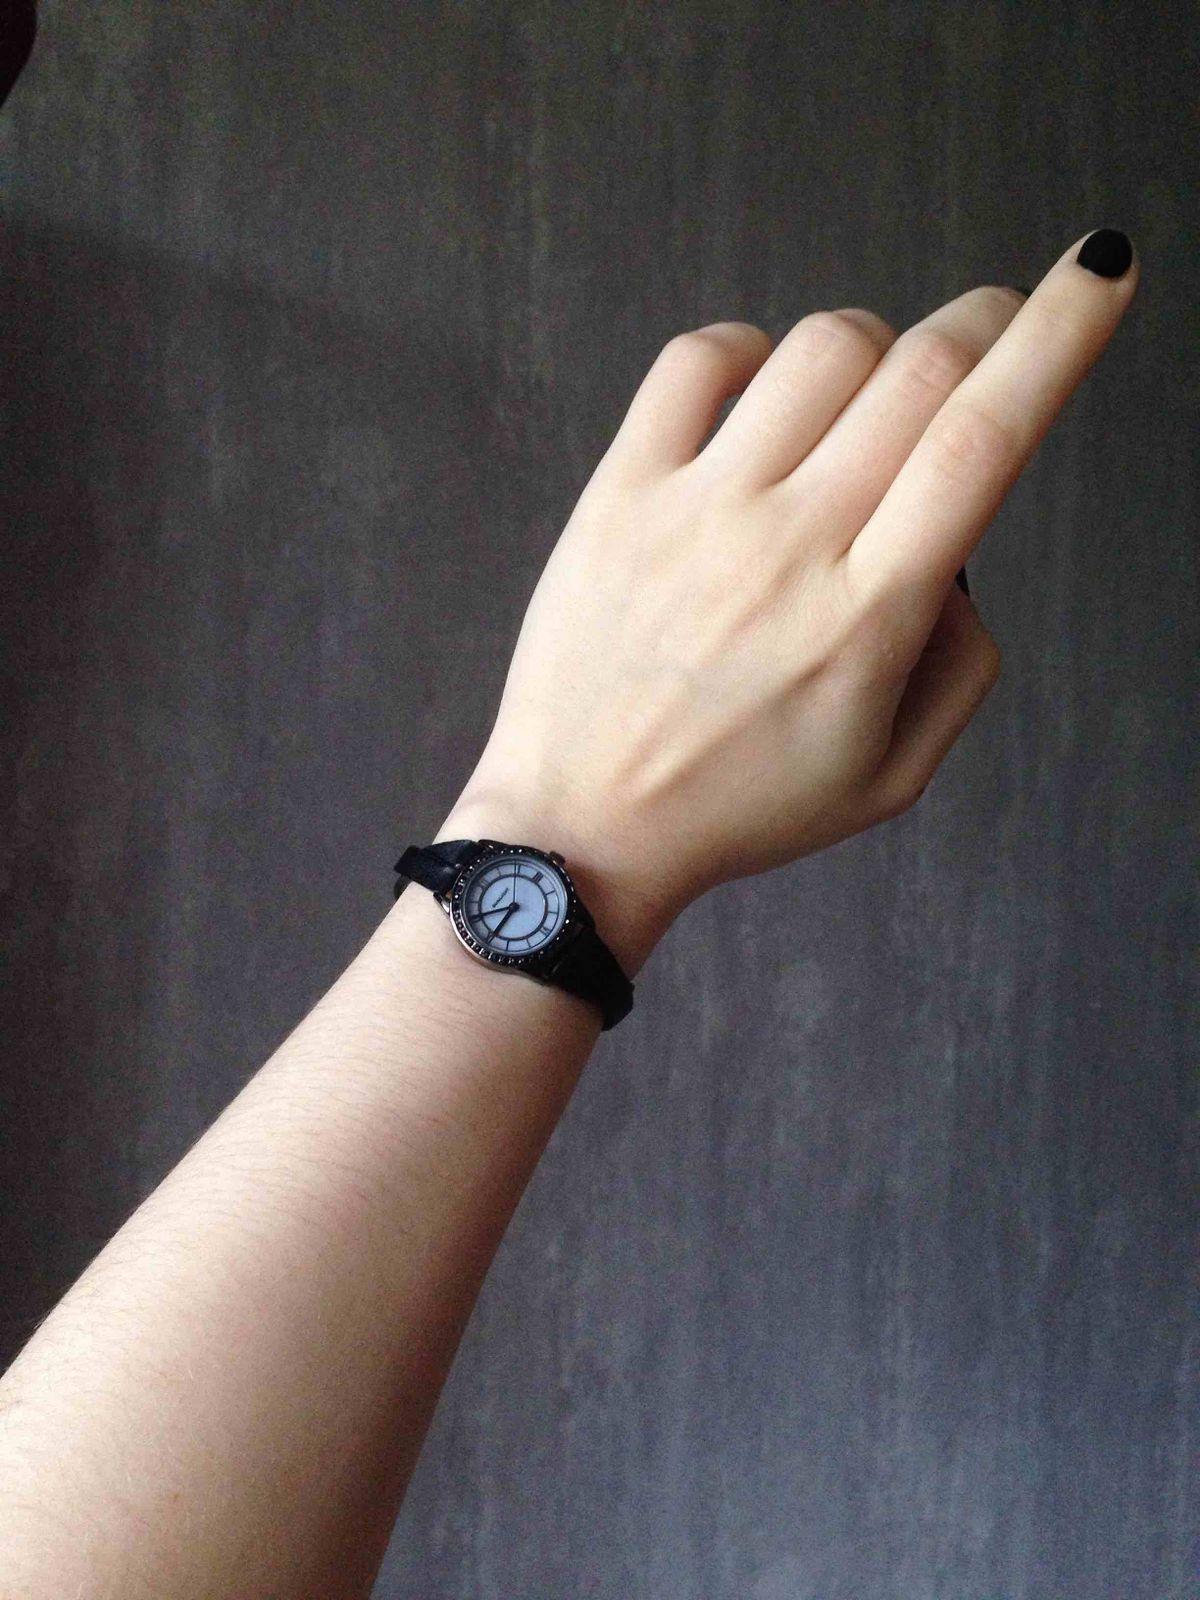 Любимые мои часы.